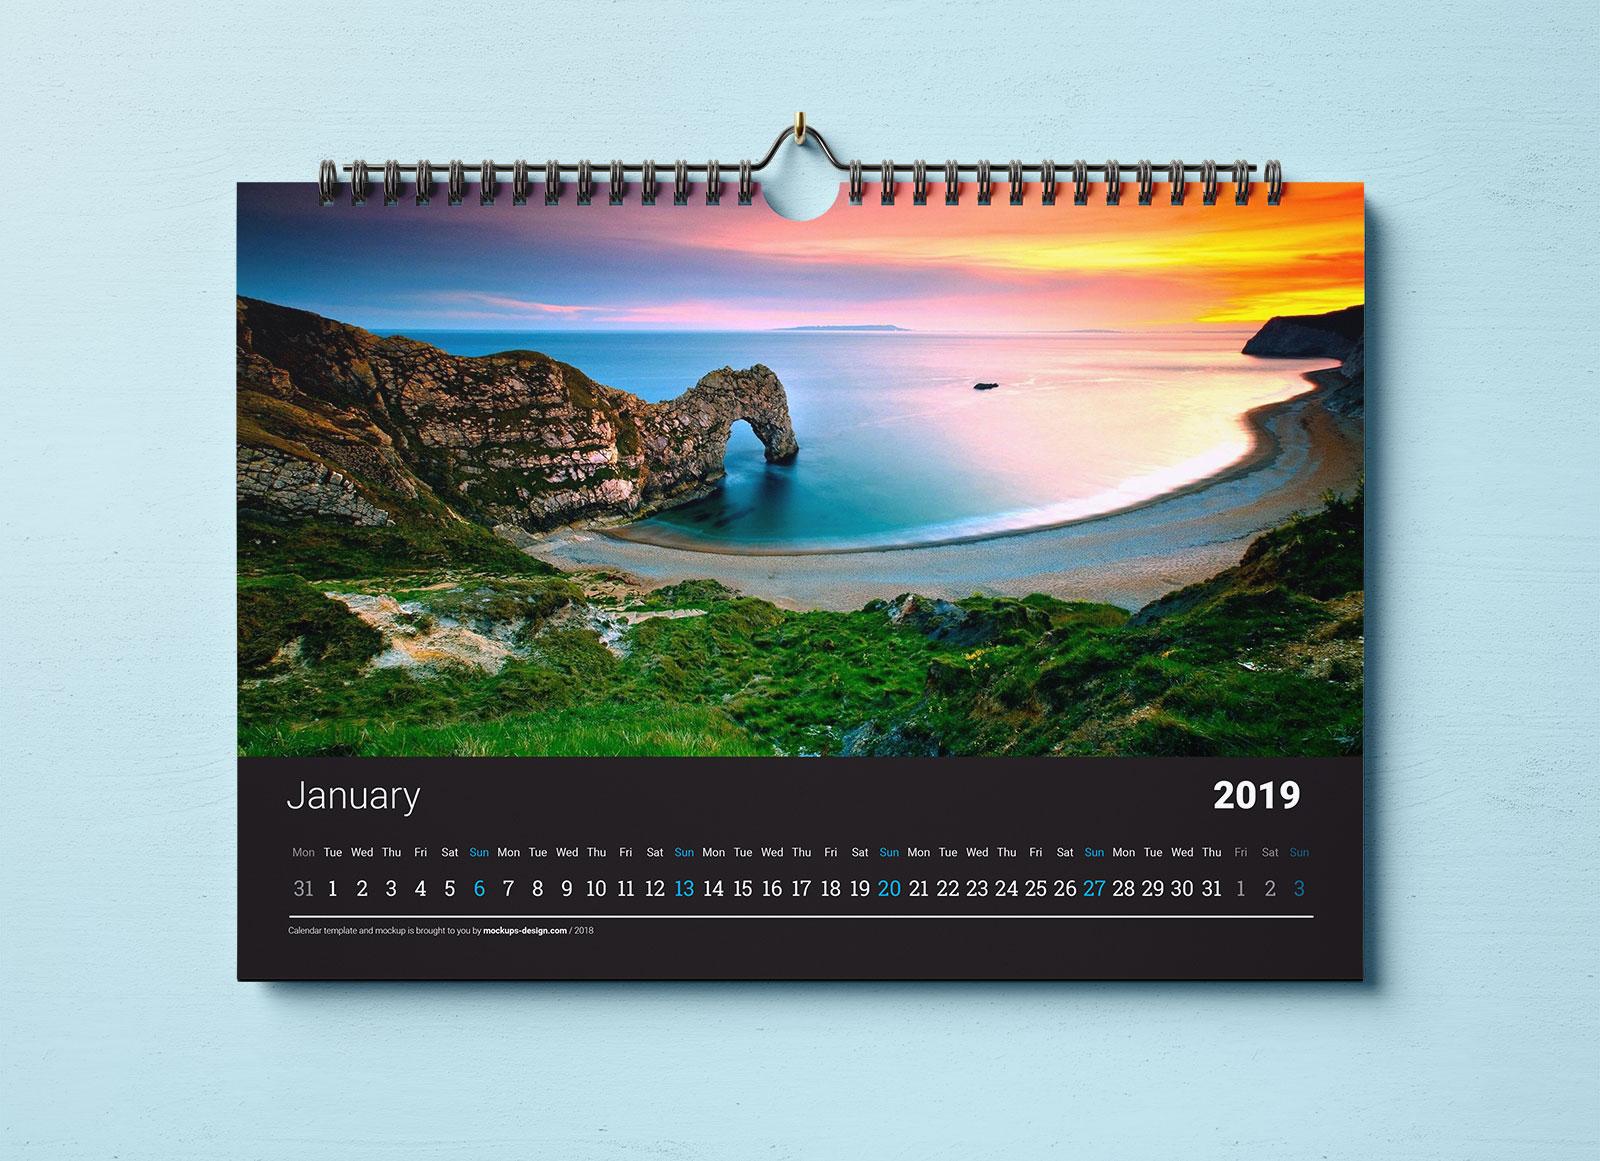 Free-Horizontal-Wall-Calendar-Mockup-PSD-Set